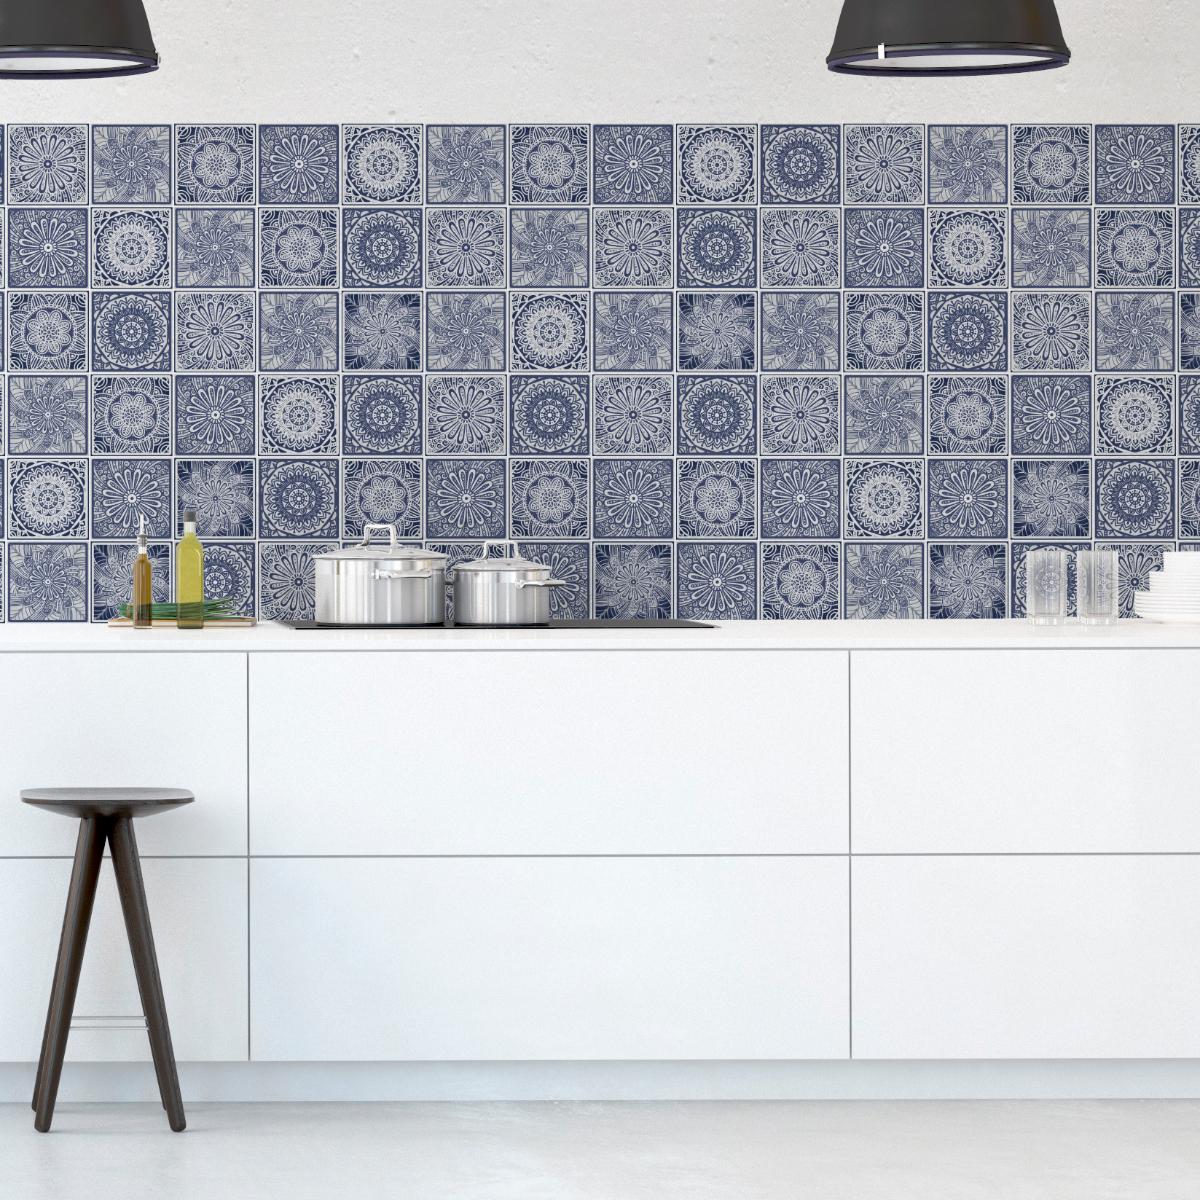 60 stickers carrelages ethnique ocatlana cuisine. Black Bedroom Furniture Sets. Home Design Ideas